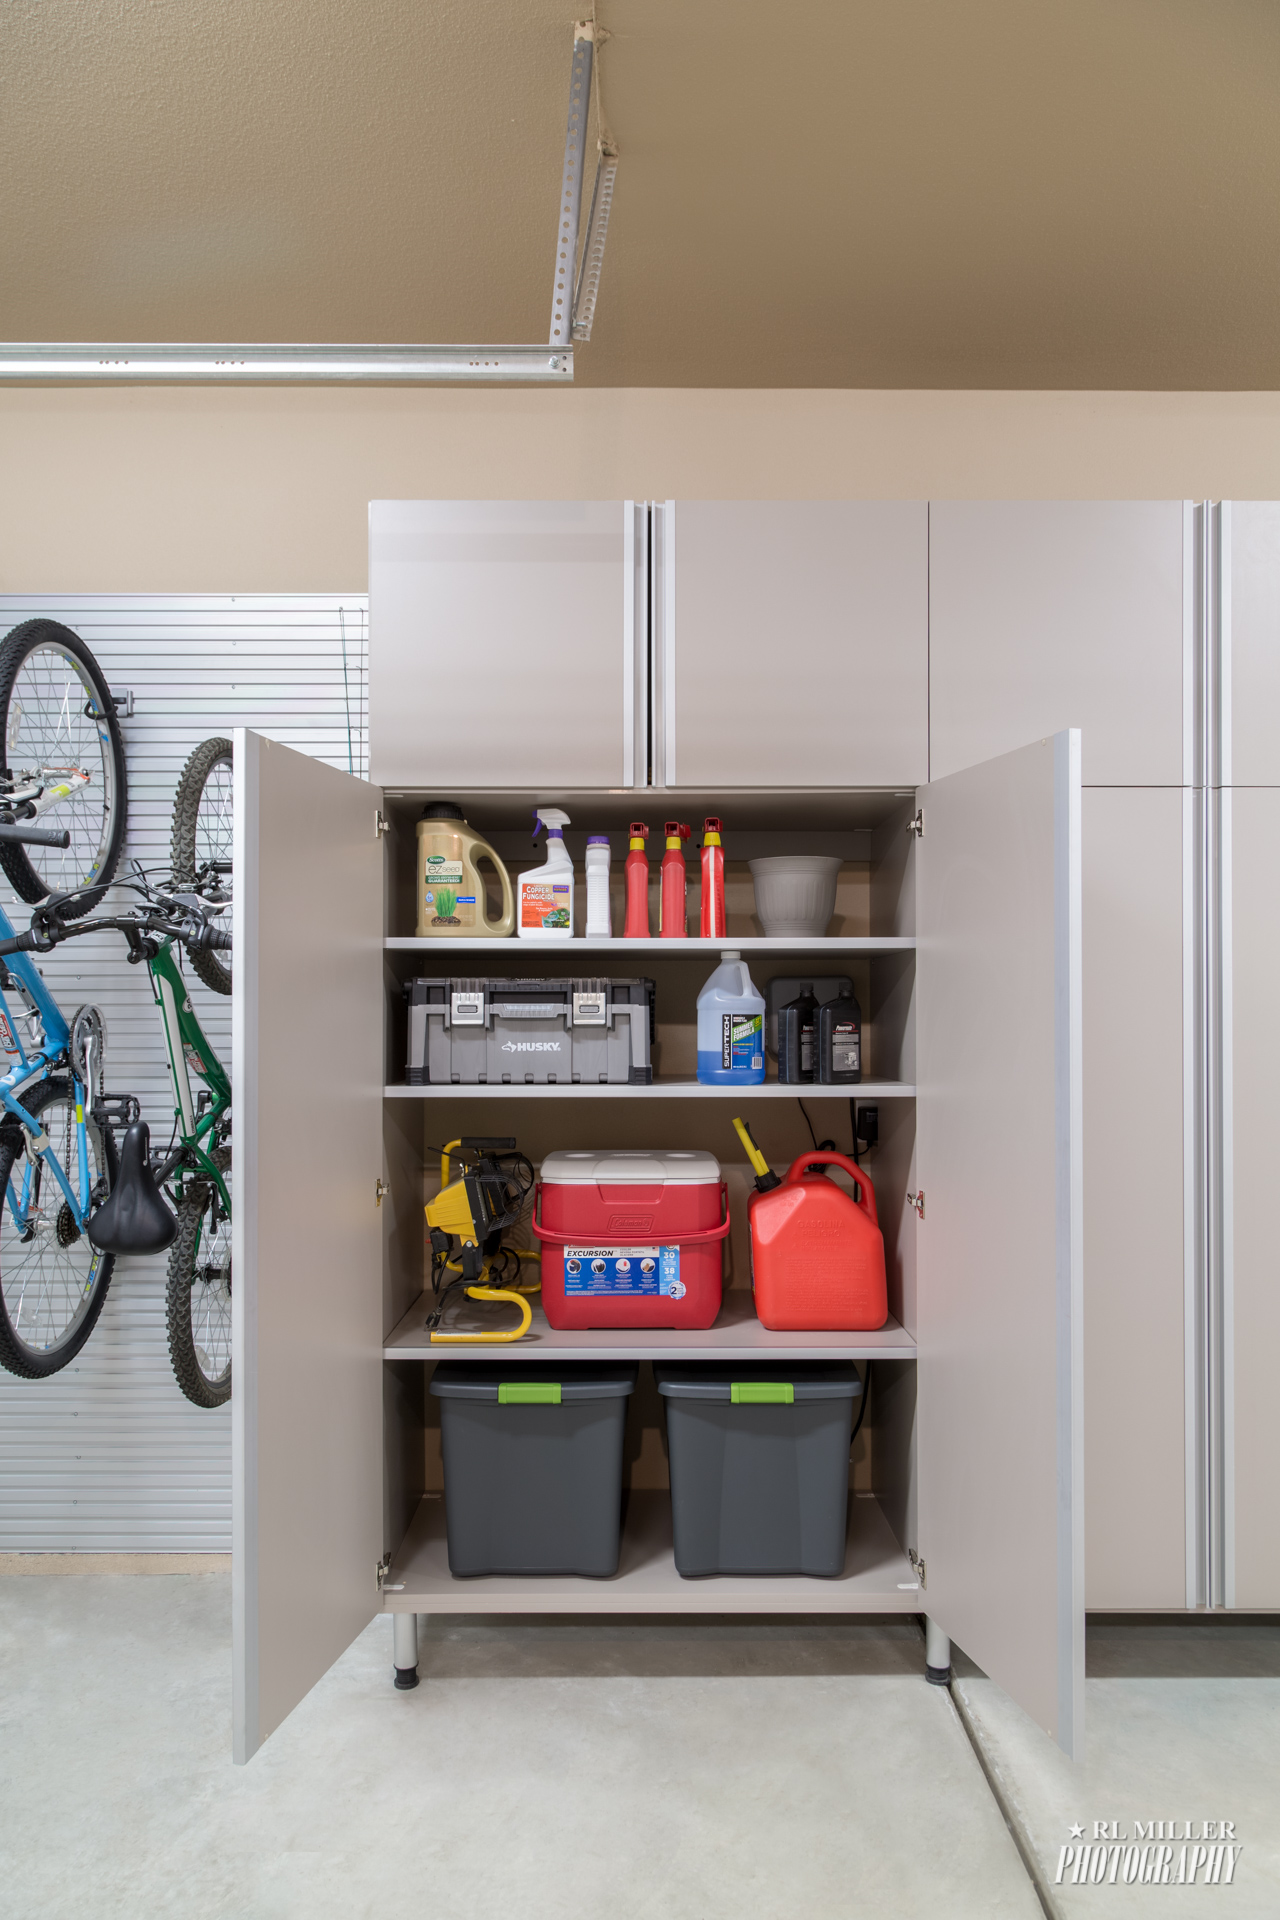 Custom Cabinets Spokane Cabinet Systems Rl Miller Photographyrl Miller Photography